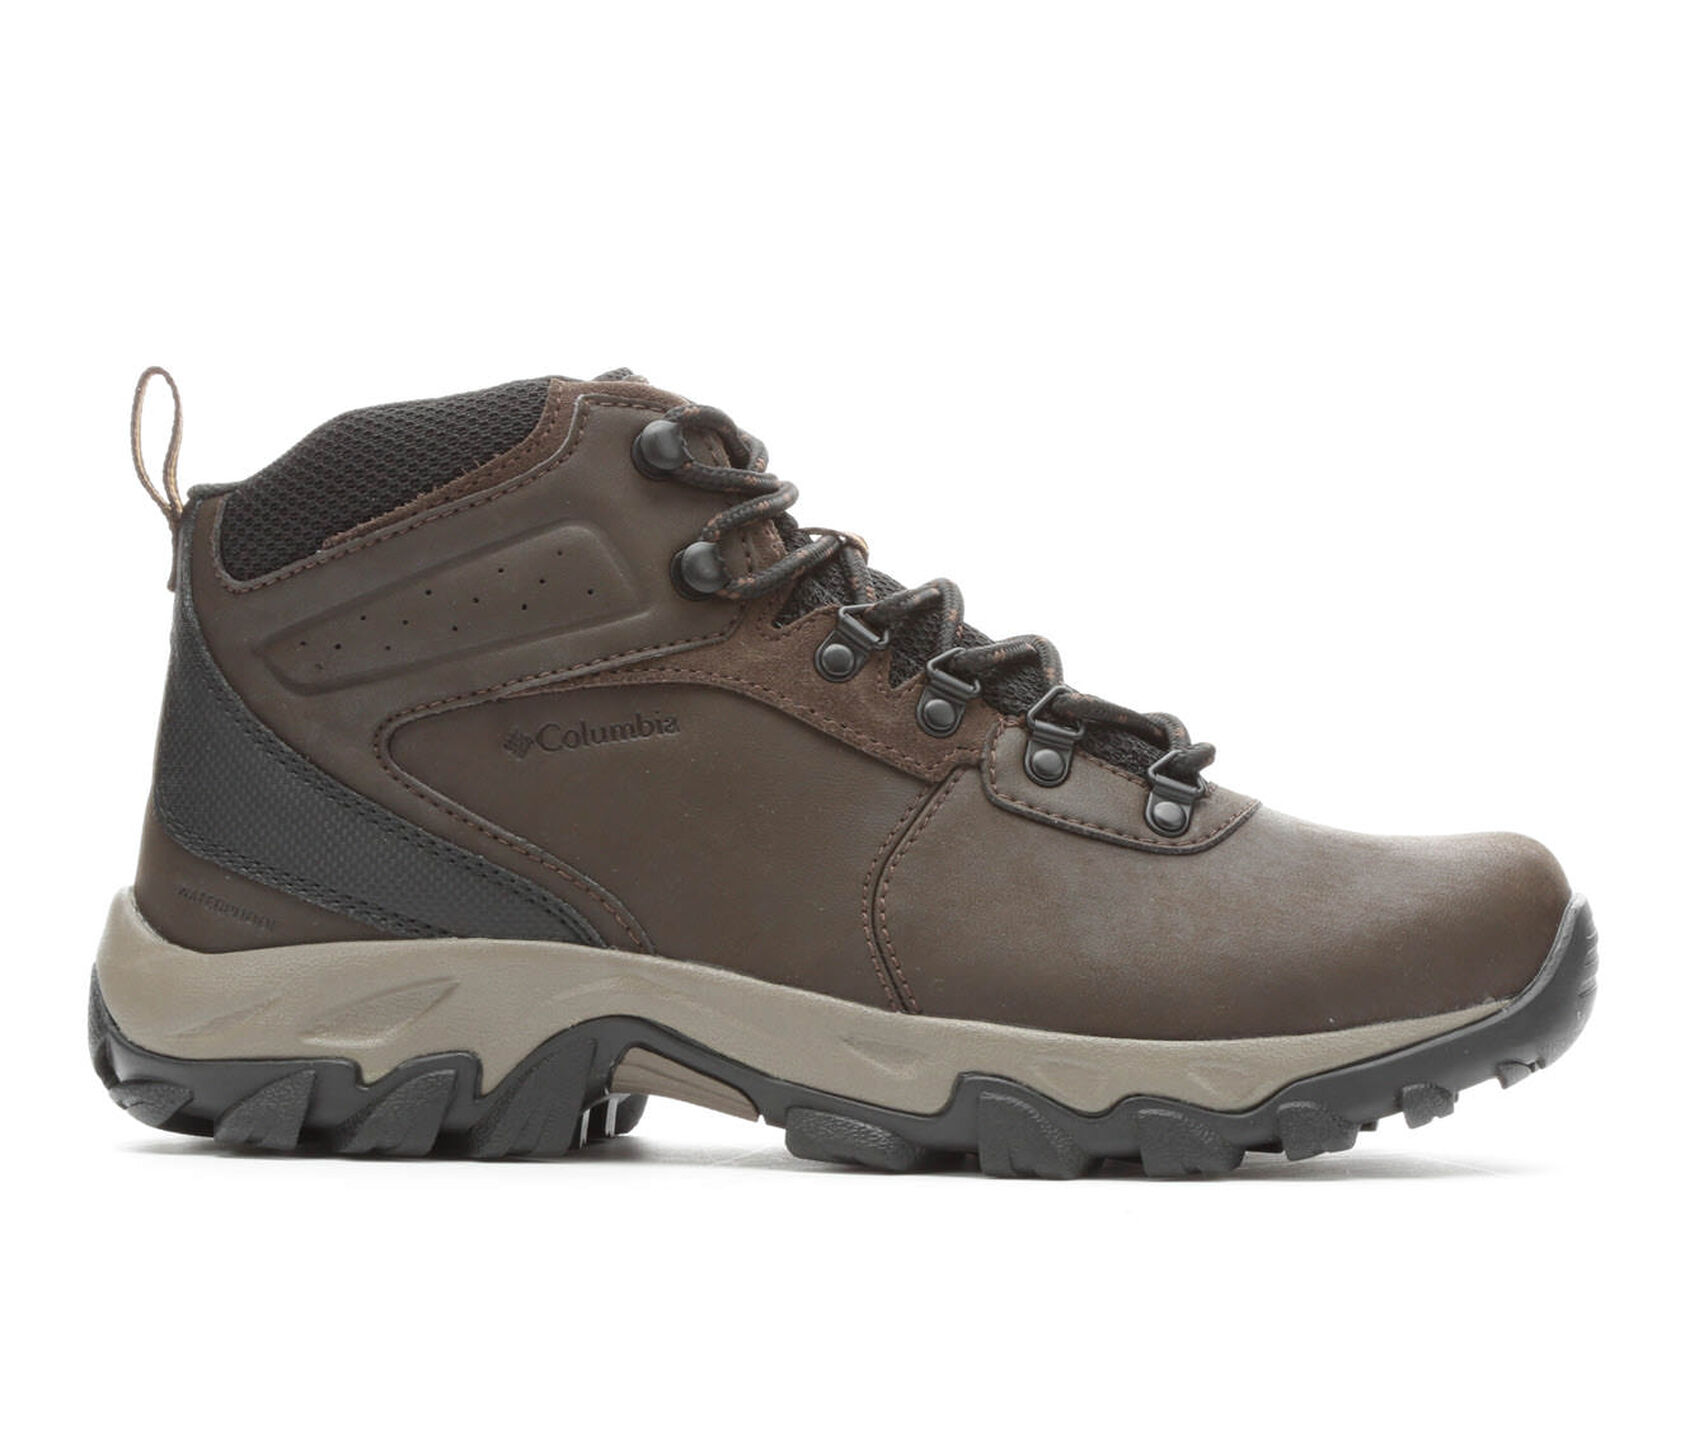 8e3b362fbd856 Men's Columbia Newton Ridge Plus II Waterproof Hiking Boots